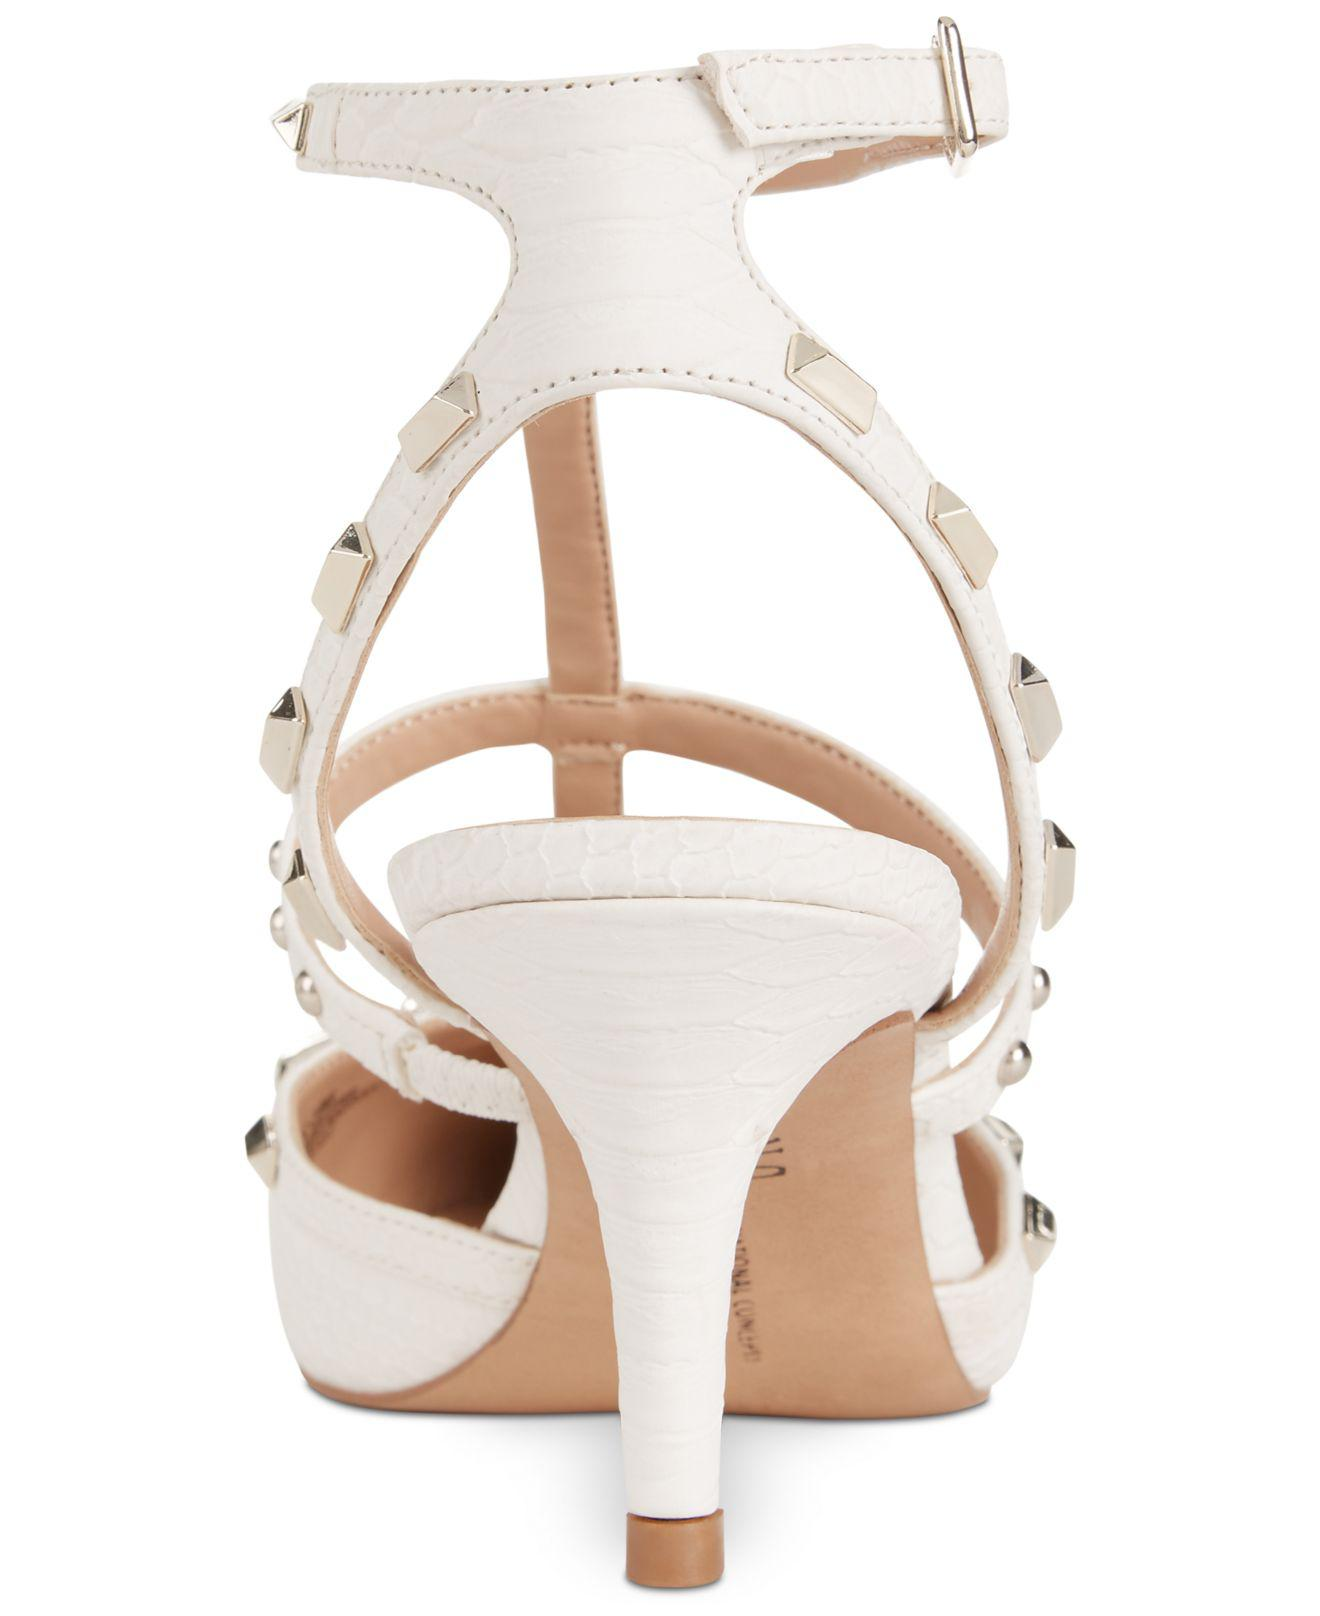 cd0591fb5f5 Lyst - INC International Concepts I.n.c. Carma Pointed Toe Studded ...